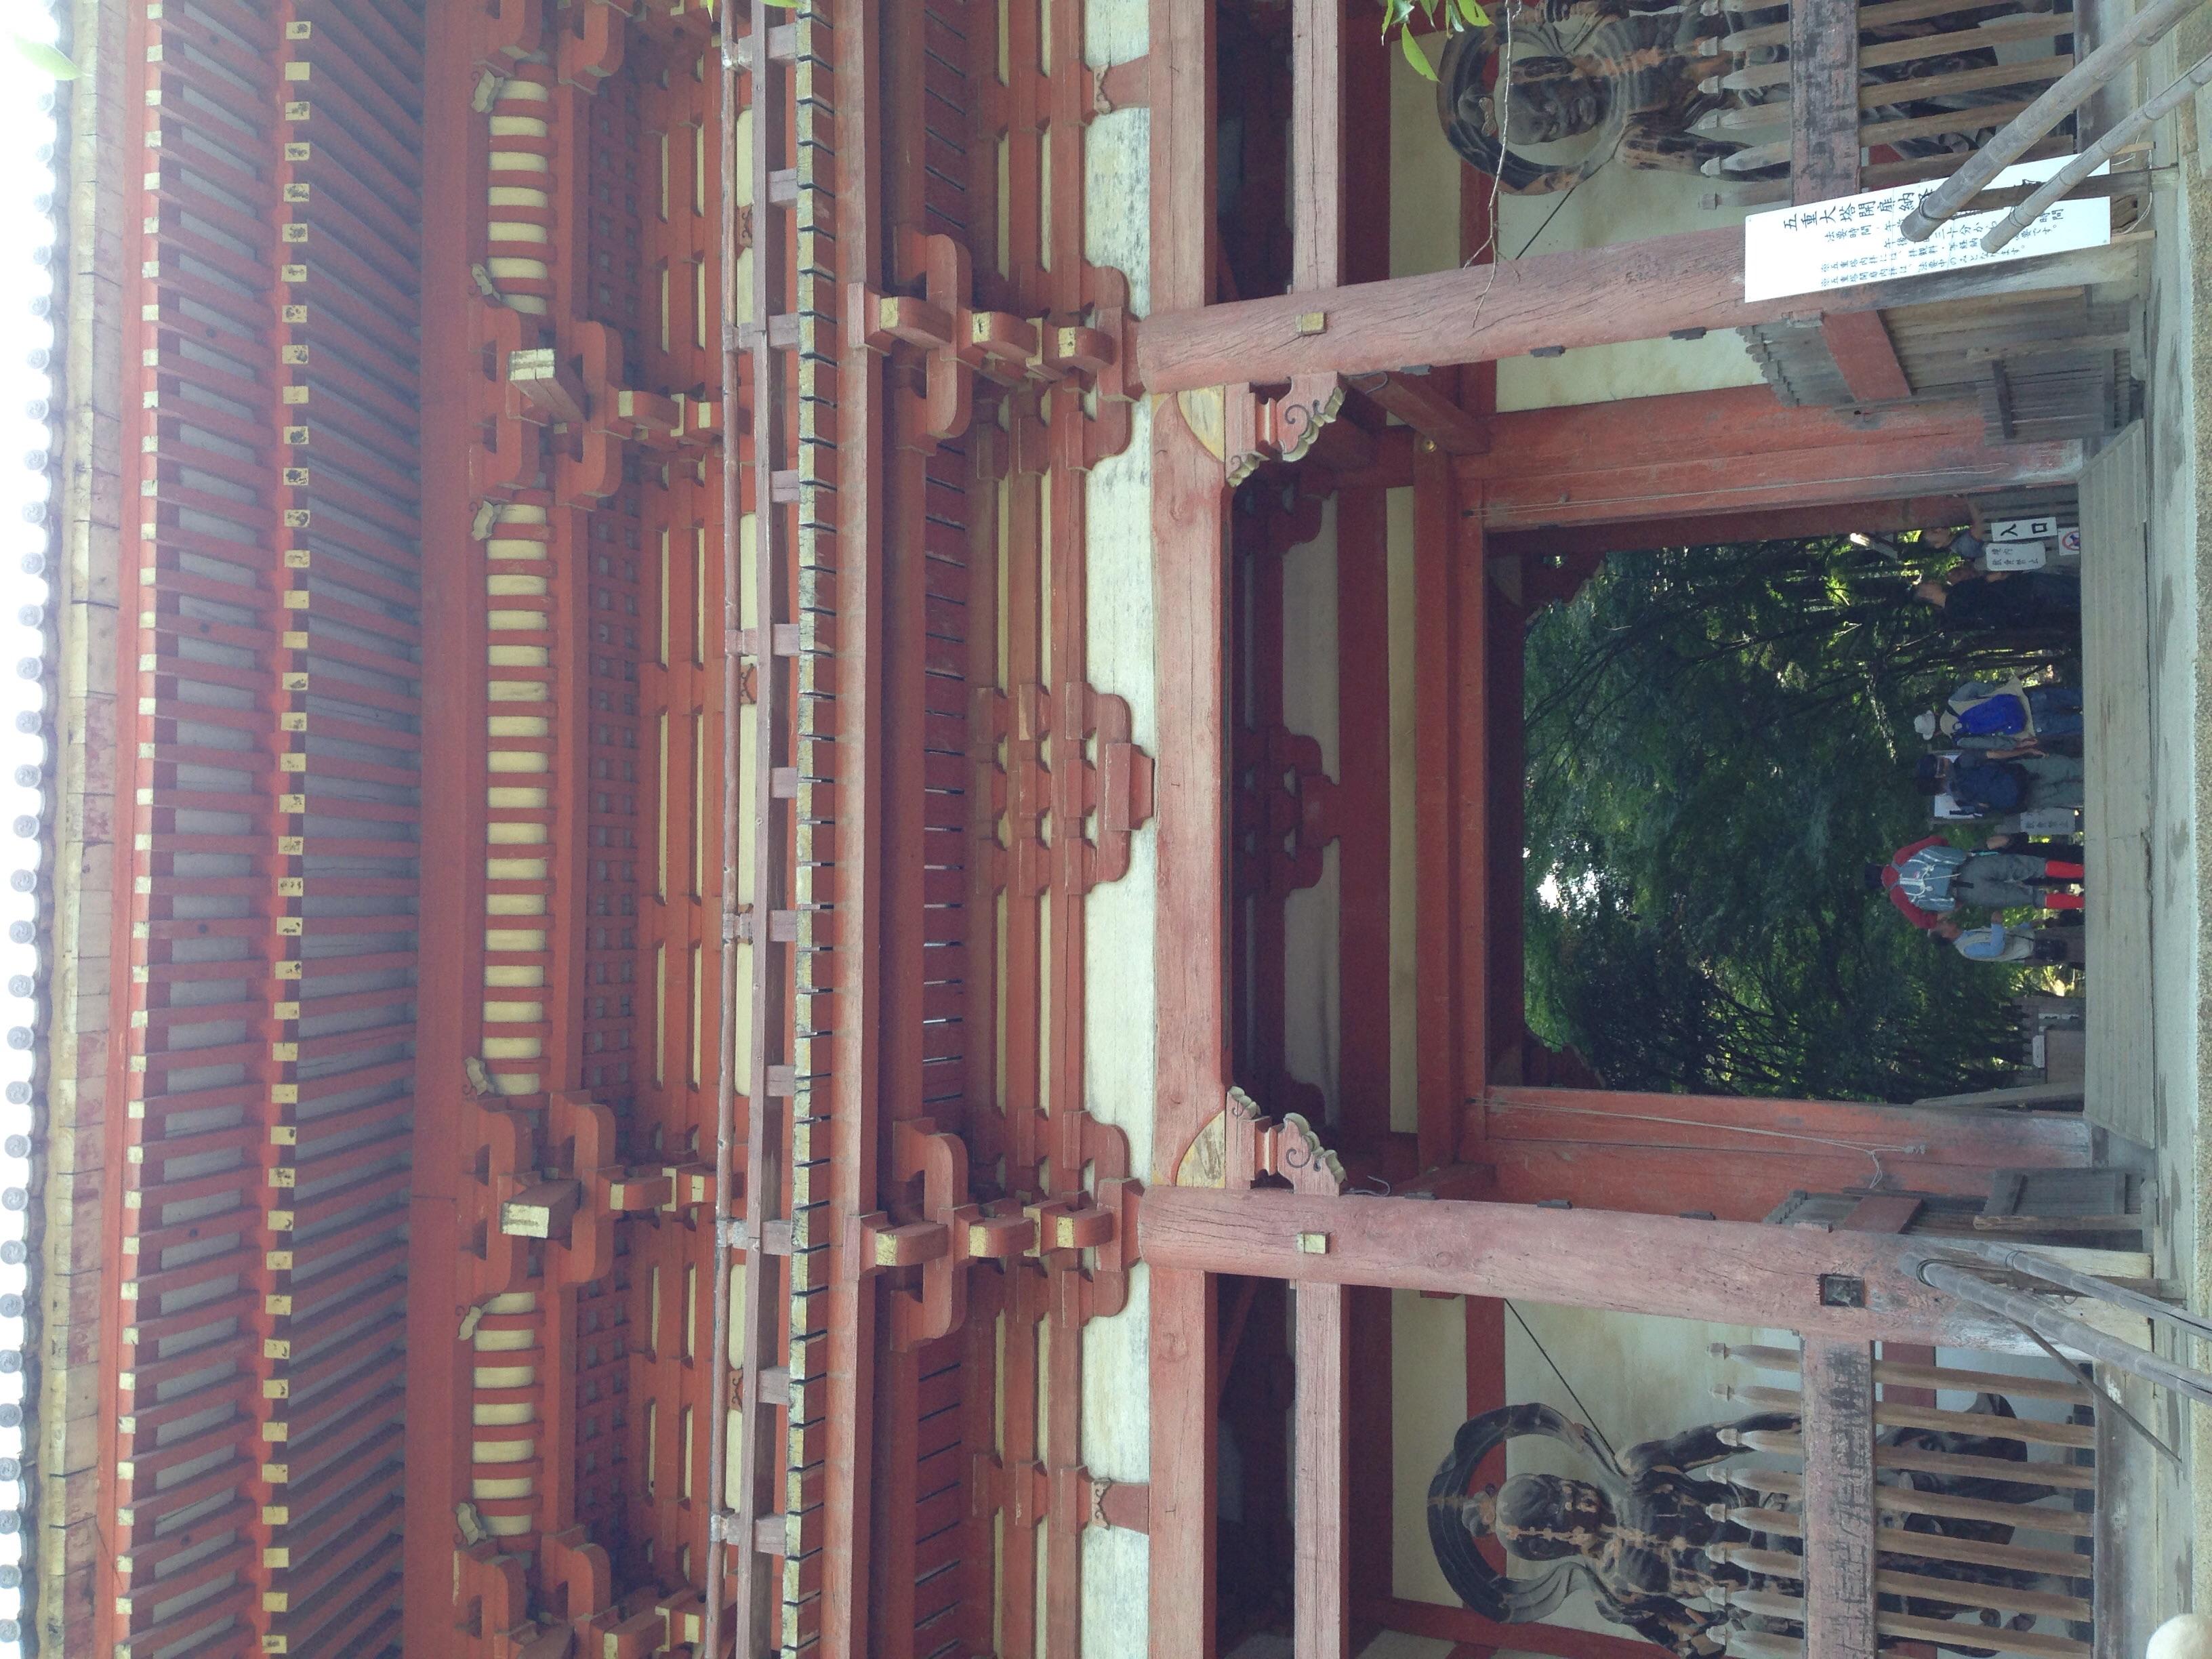 醍醐寺, Daigo-ji at Kyoto.